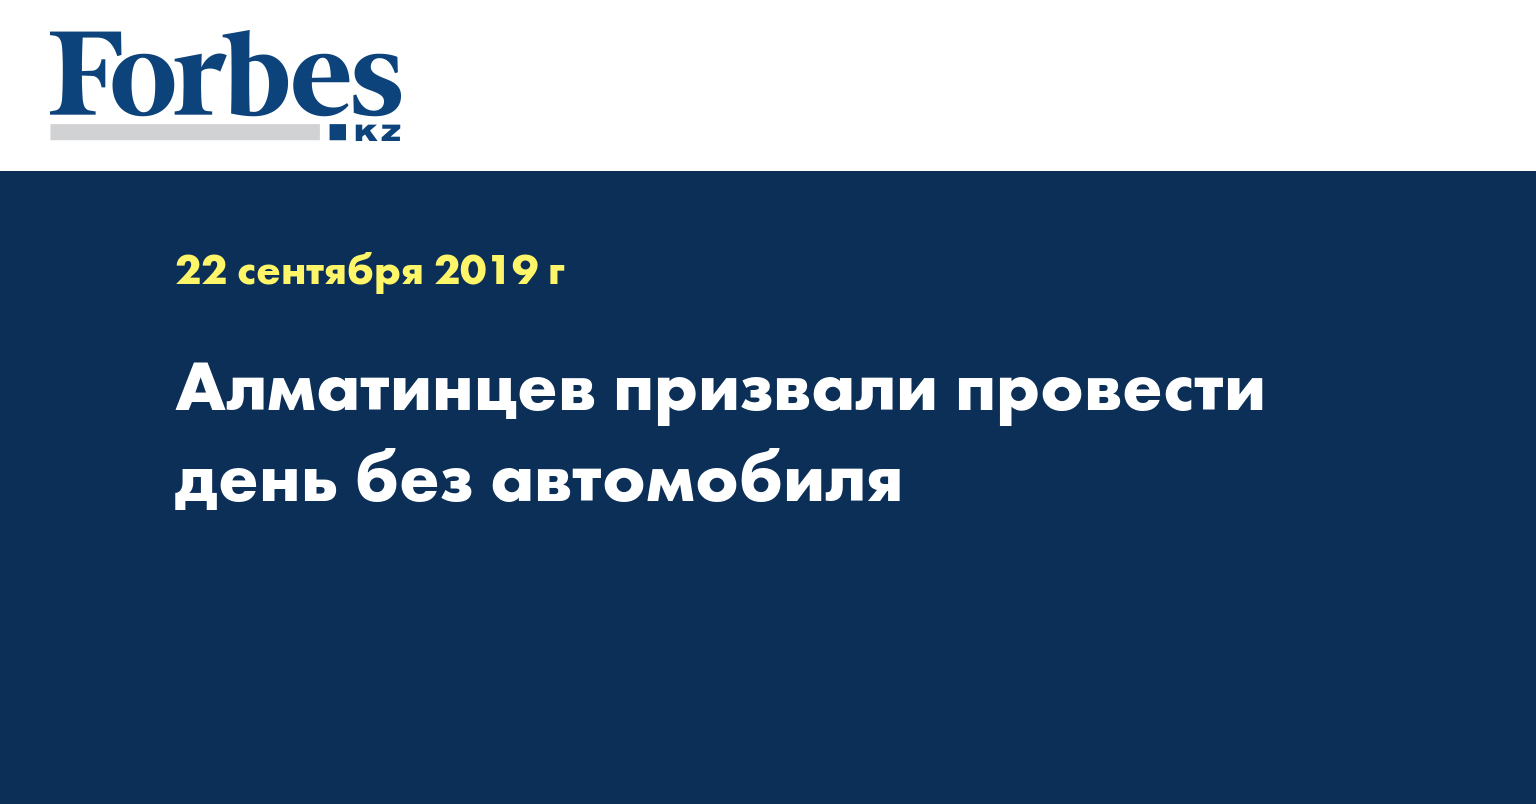 Алматинцев призвали провести день без автомобиля